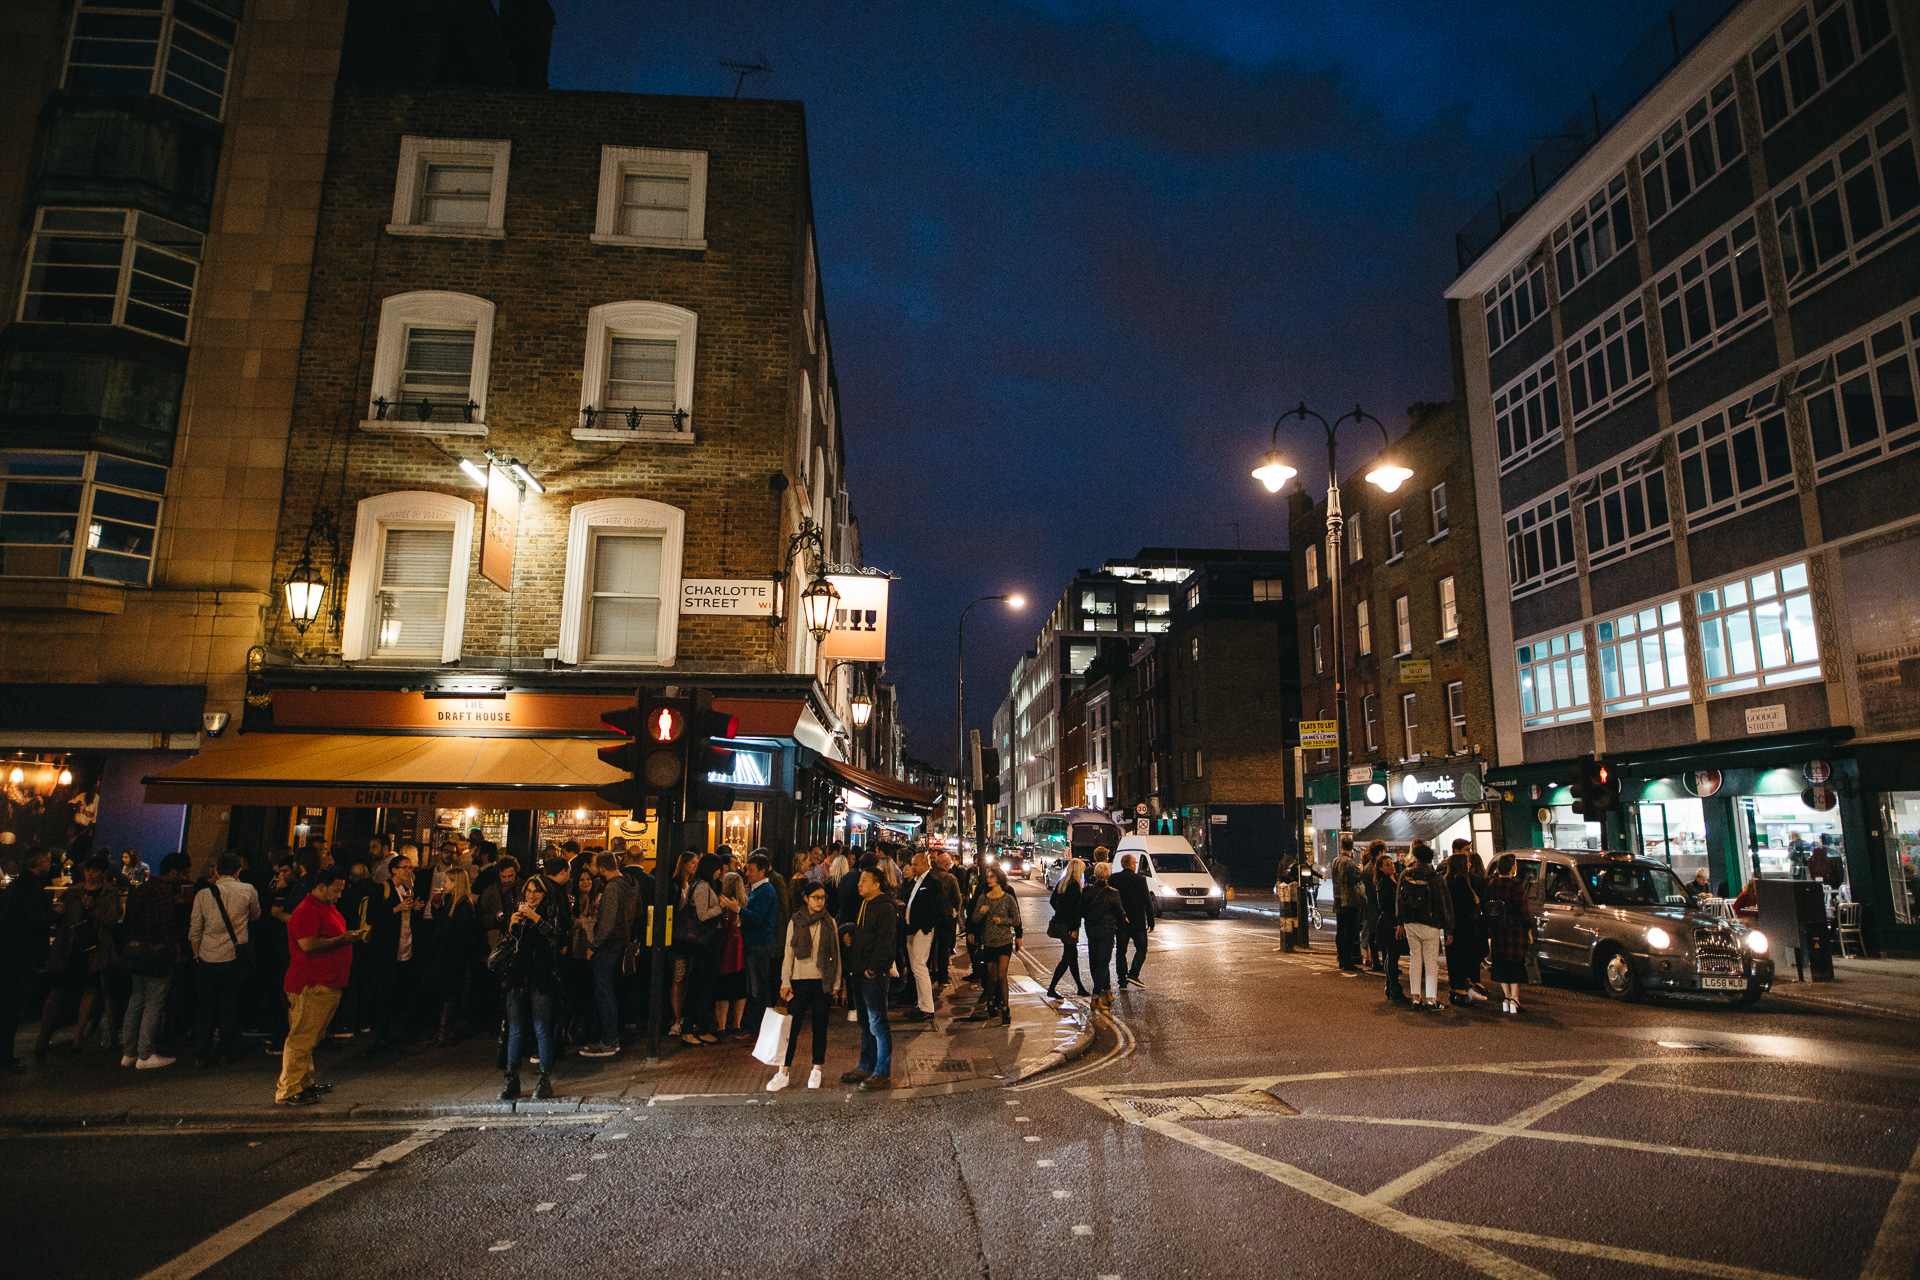 gabor_lenart_london_photographer_street_blogger_lifestyle_img_5086